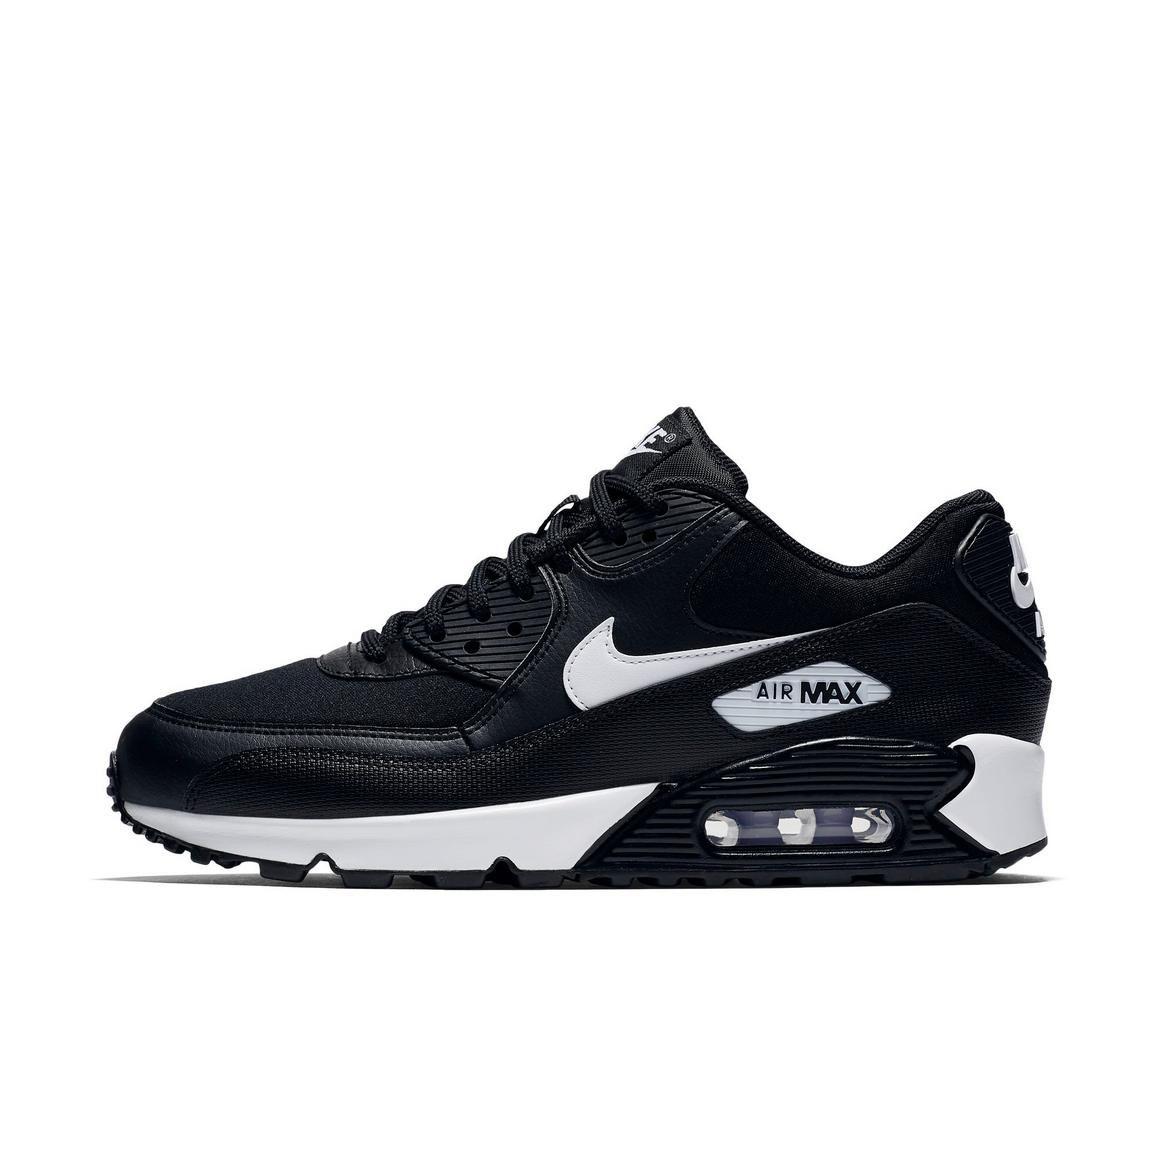 Nike Air Max 90 Women's Casual Shoe in 2020 Nike air max